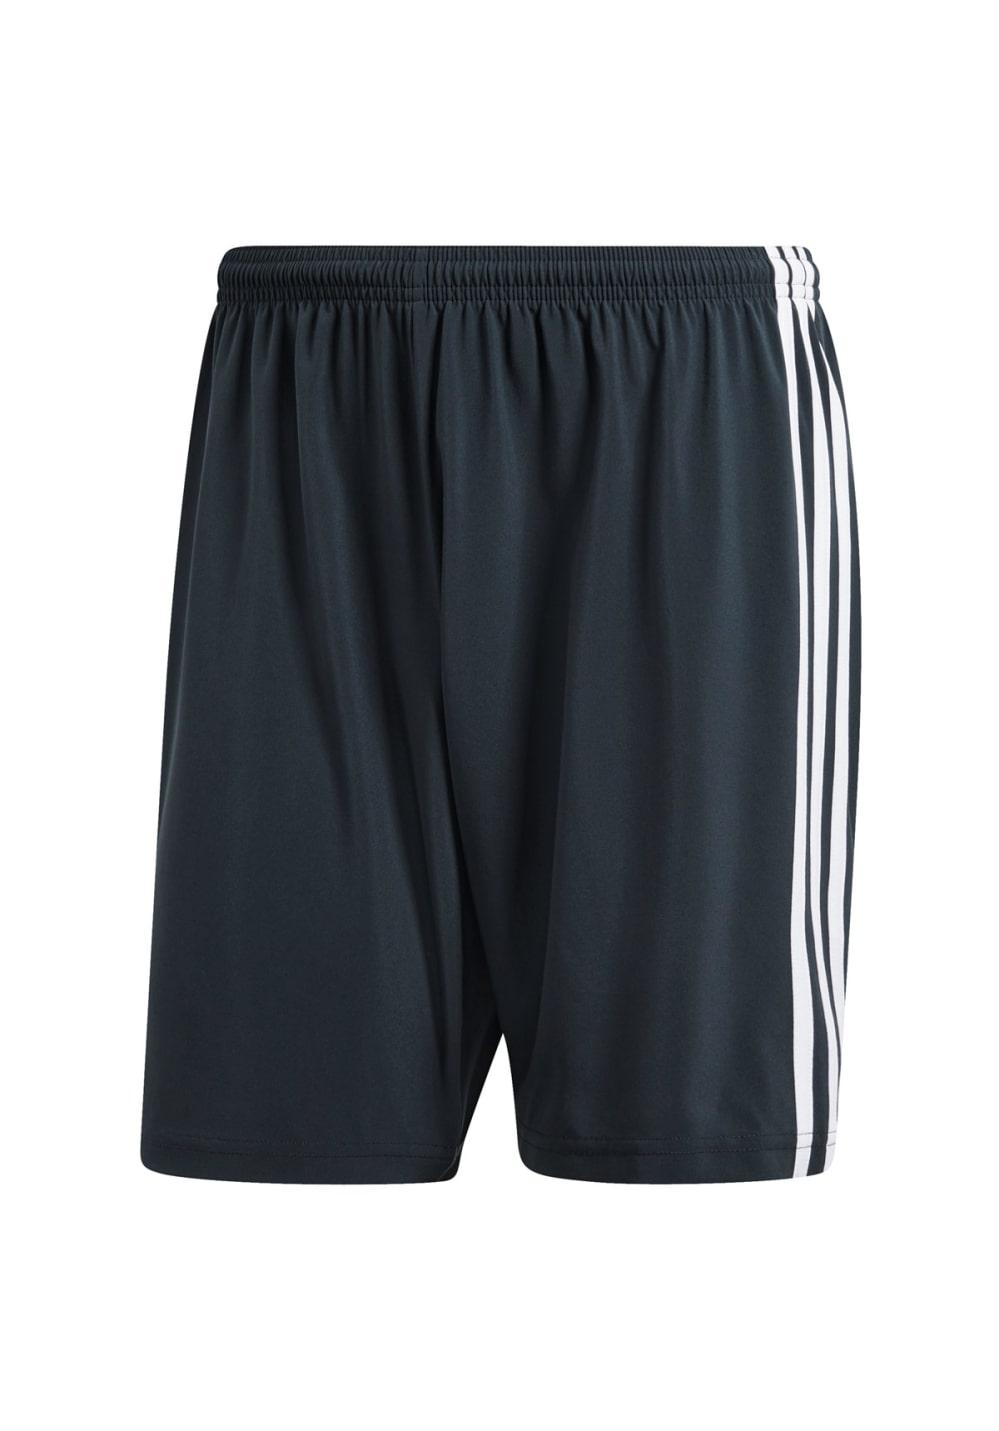 adidas Condivo 18 Shorts Pantalons fitness pour Homme Noir